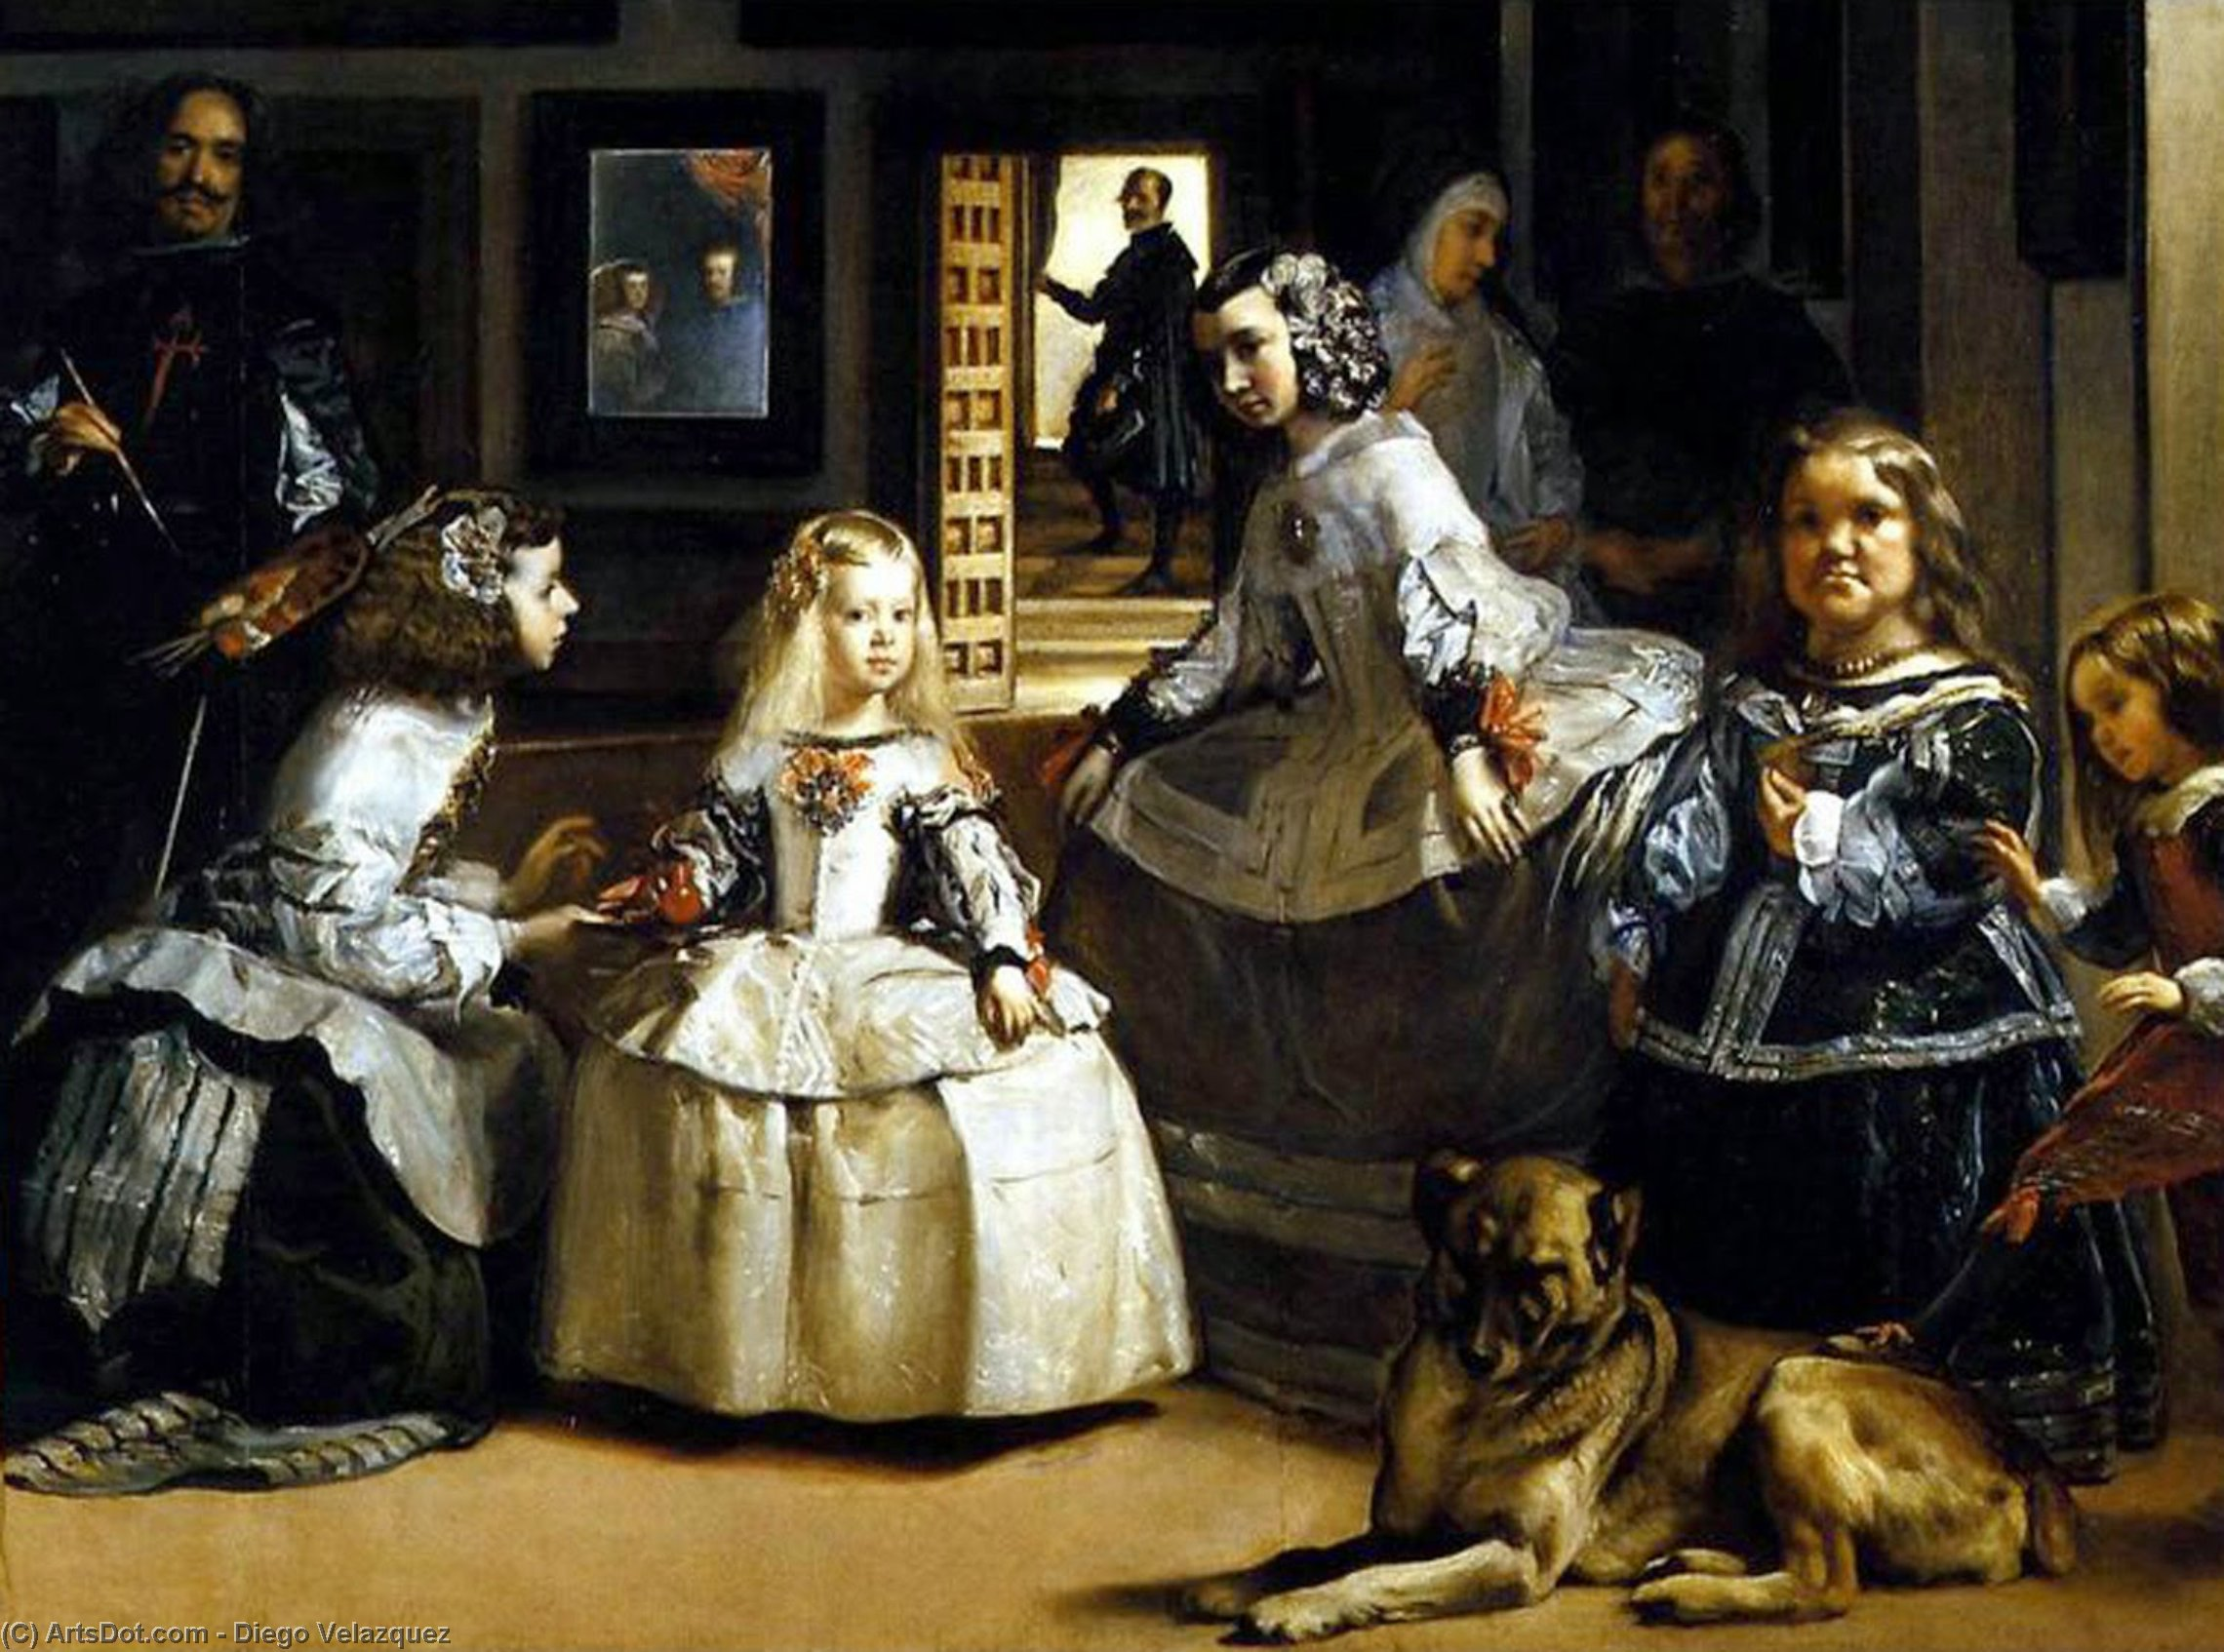 Wikioo.org - The Encyclopedia of Fine Arts - Painting, Artwork by Diego Velazquez - Las Meninas (detail)